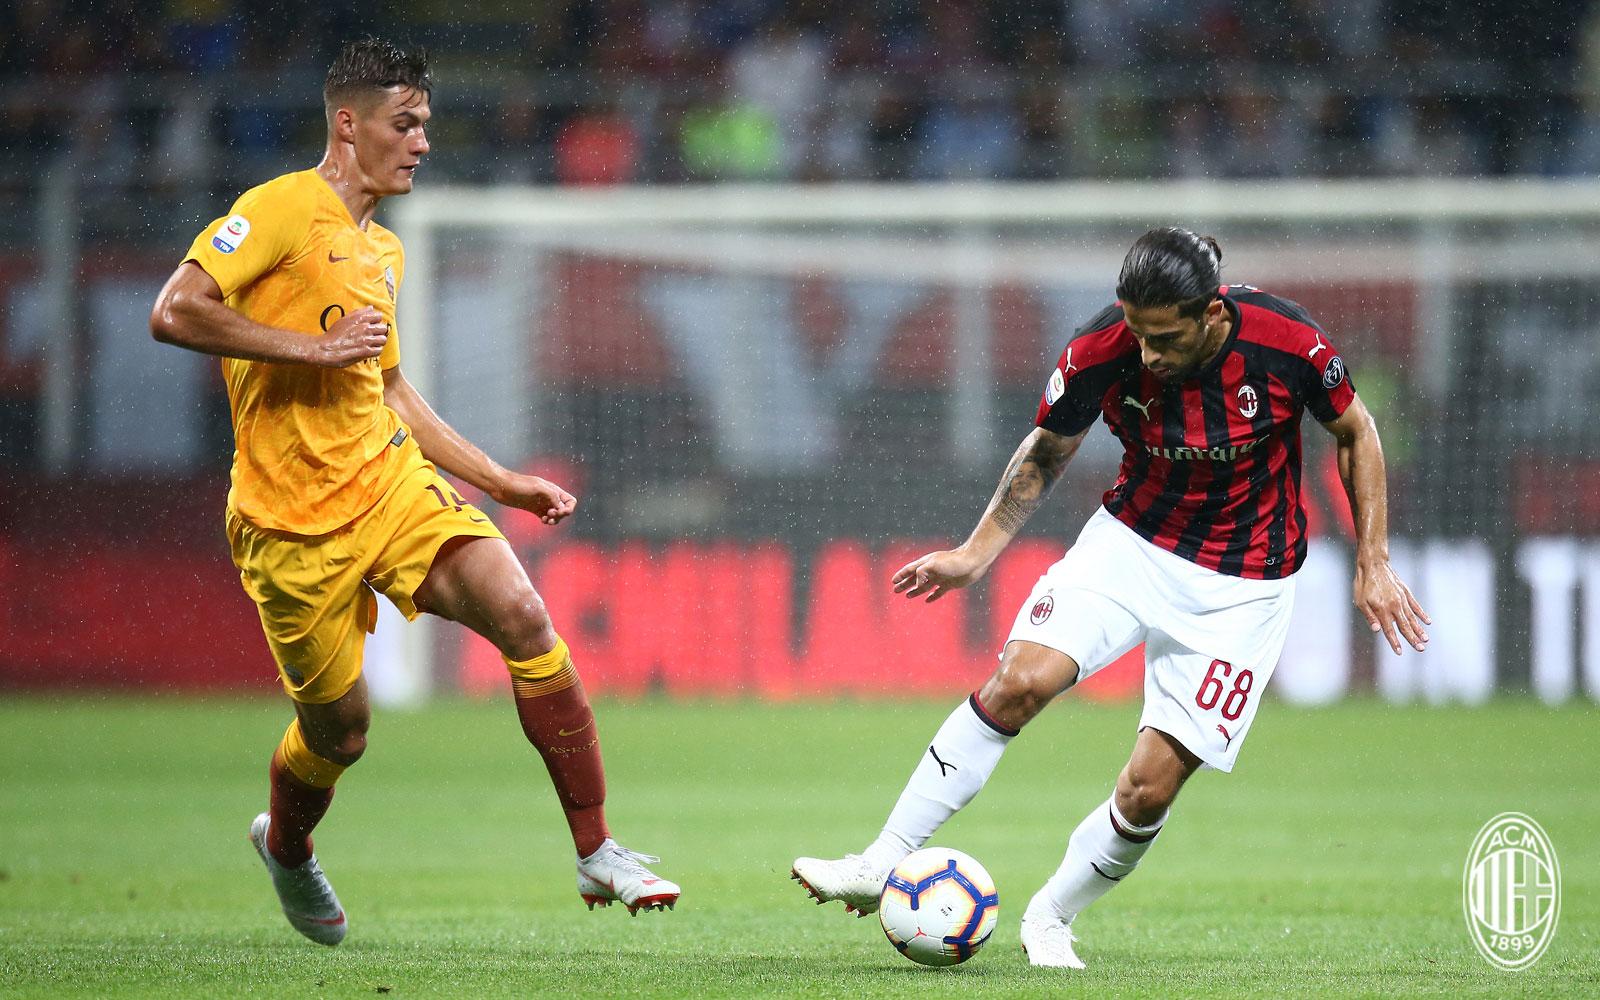 Ricardo Rodriguez and Patrik Schick during Milan-Roma at Stadio San Siro on August 31, 2018. (@acmilan.com)